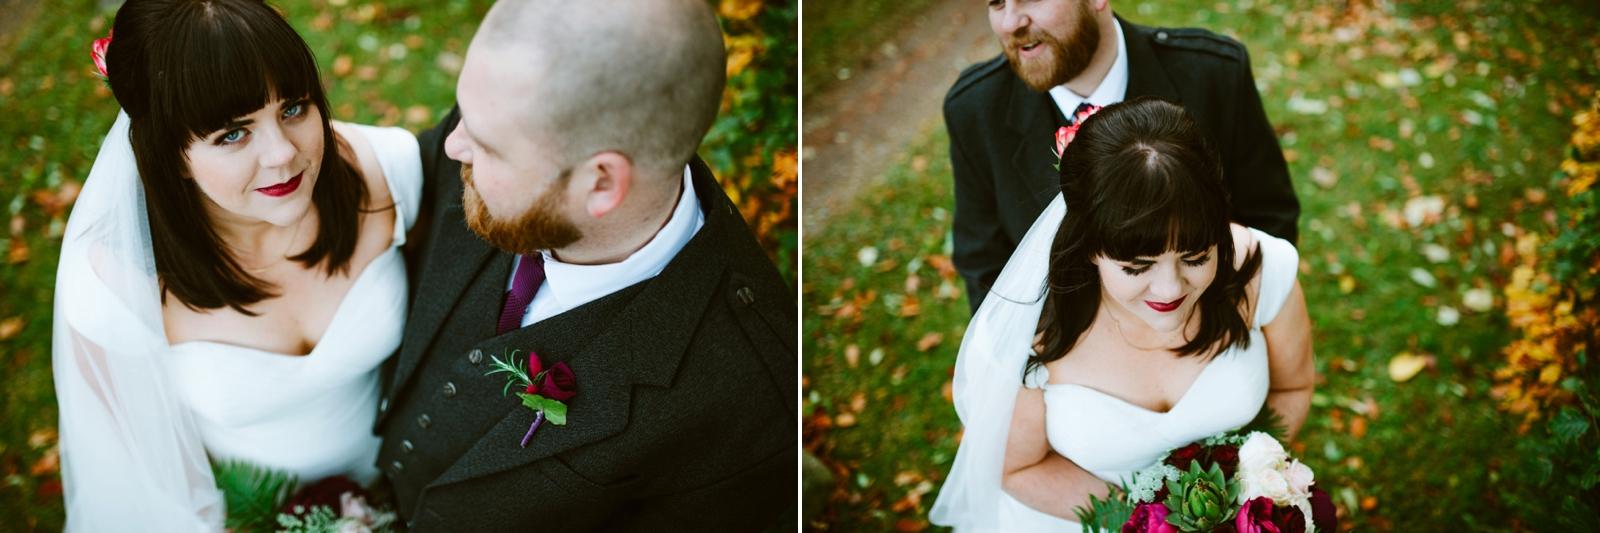 alternative-wedding-photography-scotland-katie-stephen-aikwood-tower-312.jpg